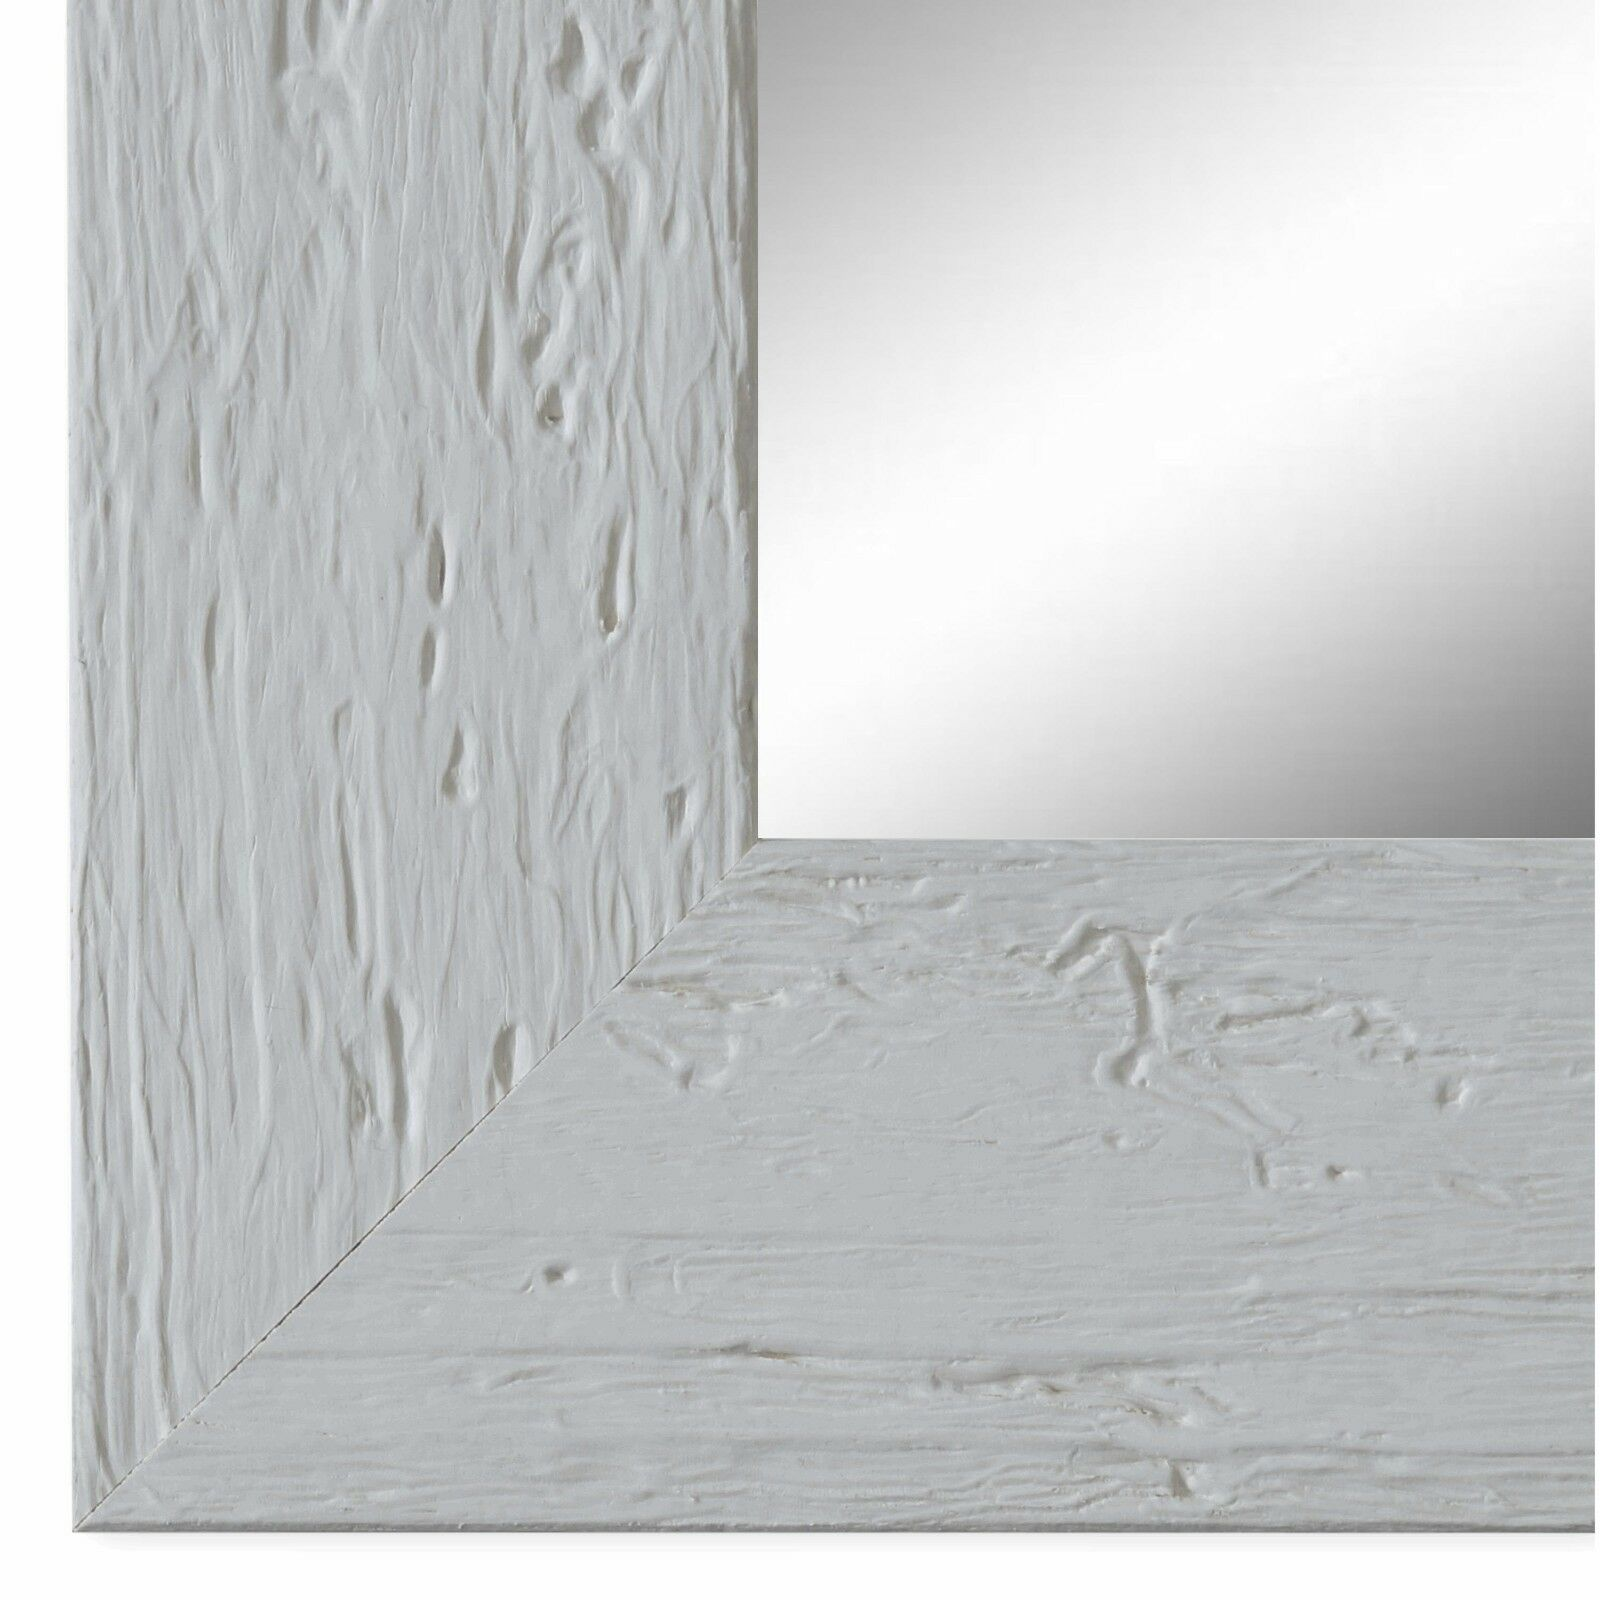 Wandspiegel Spiegel Weiss Rustikal Retro Holz Capri 5 8 Neu Alle